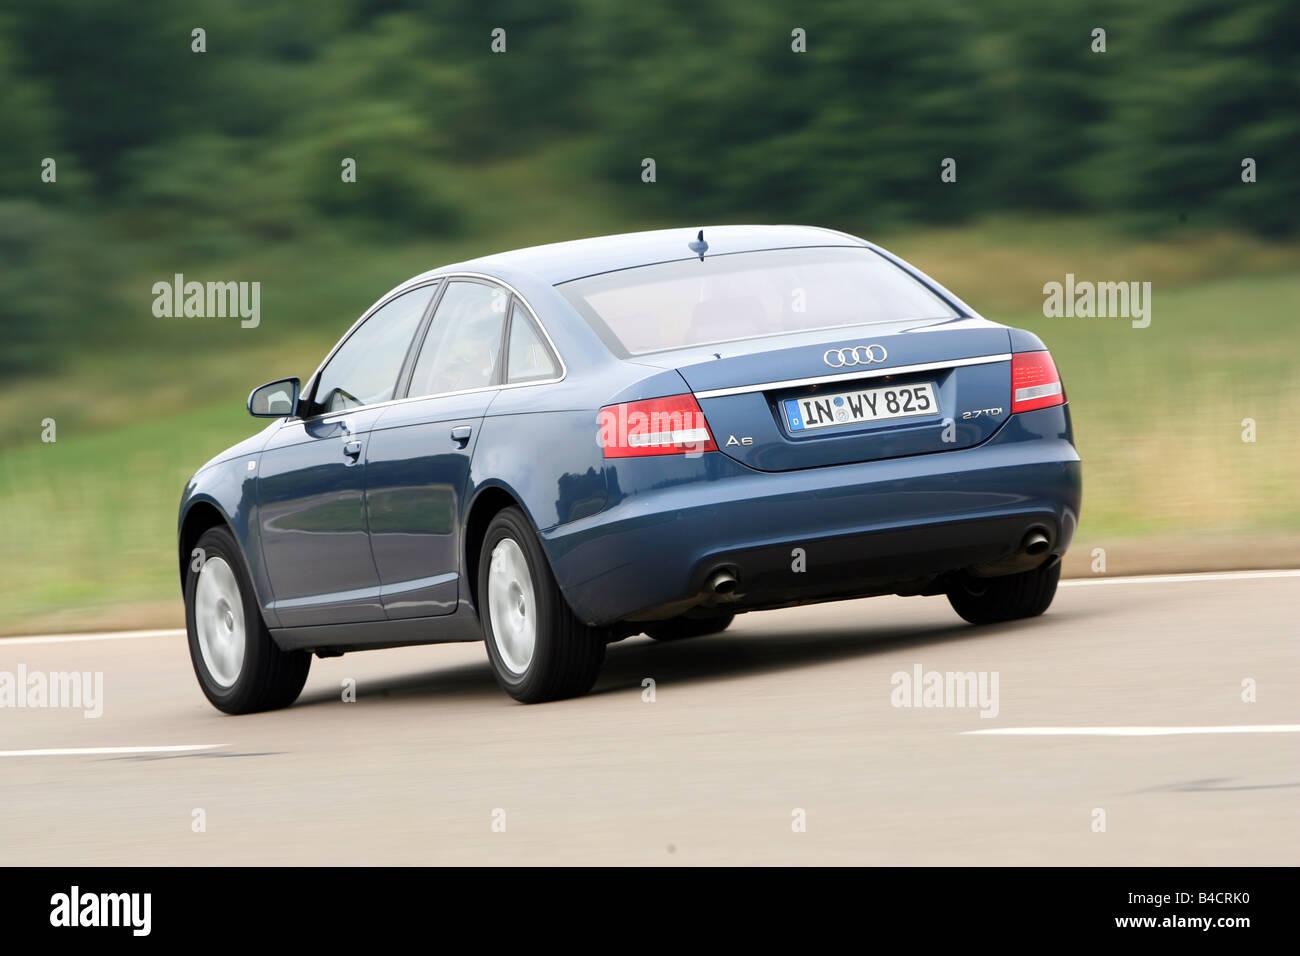 Kelebihan Kekurangan Audi 2.7 Tdi Murah Berkualitas